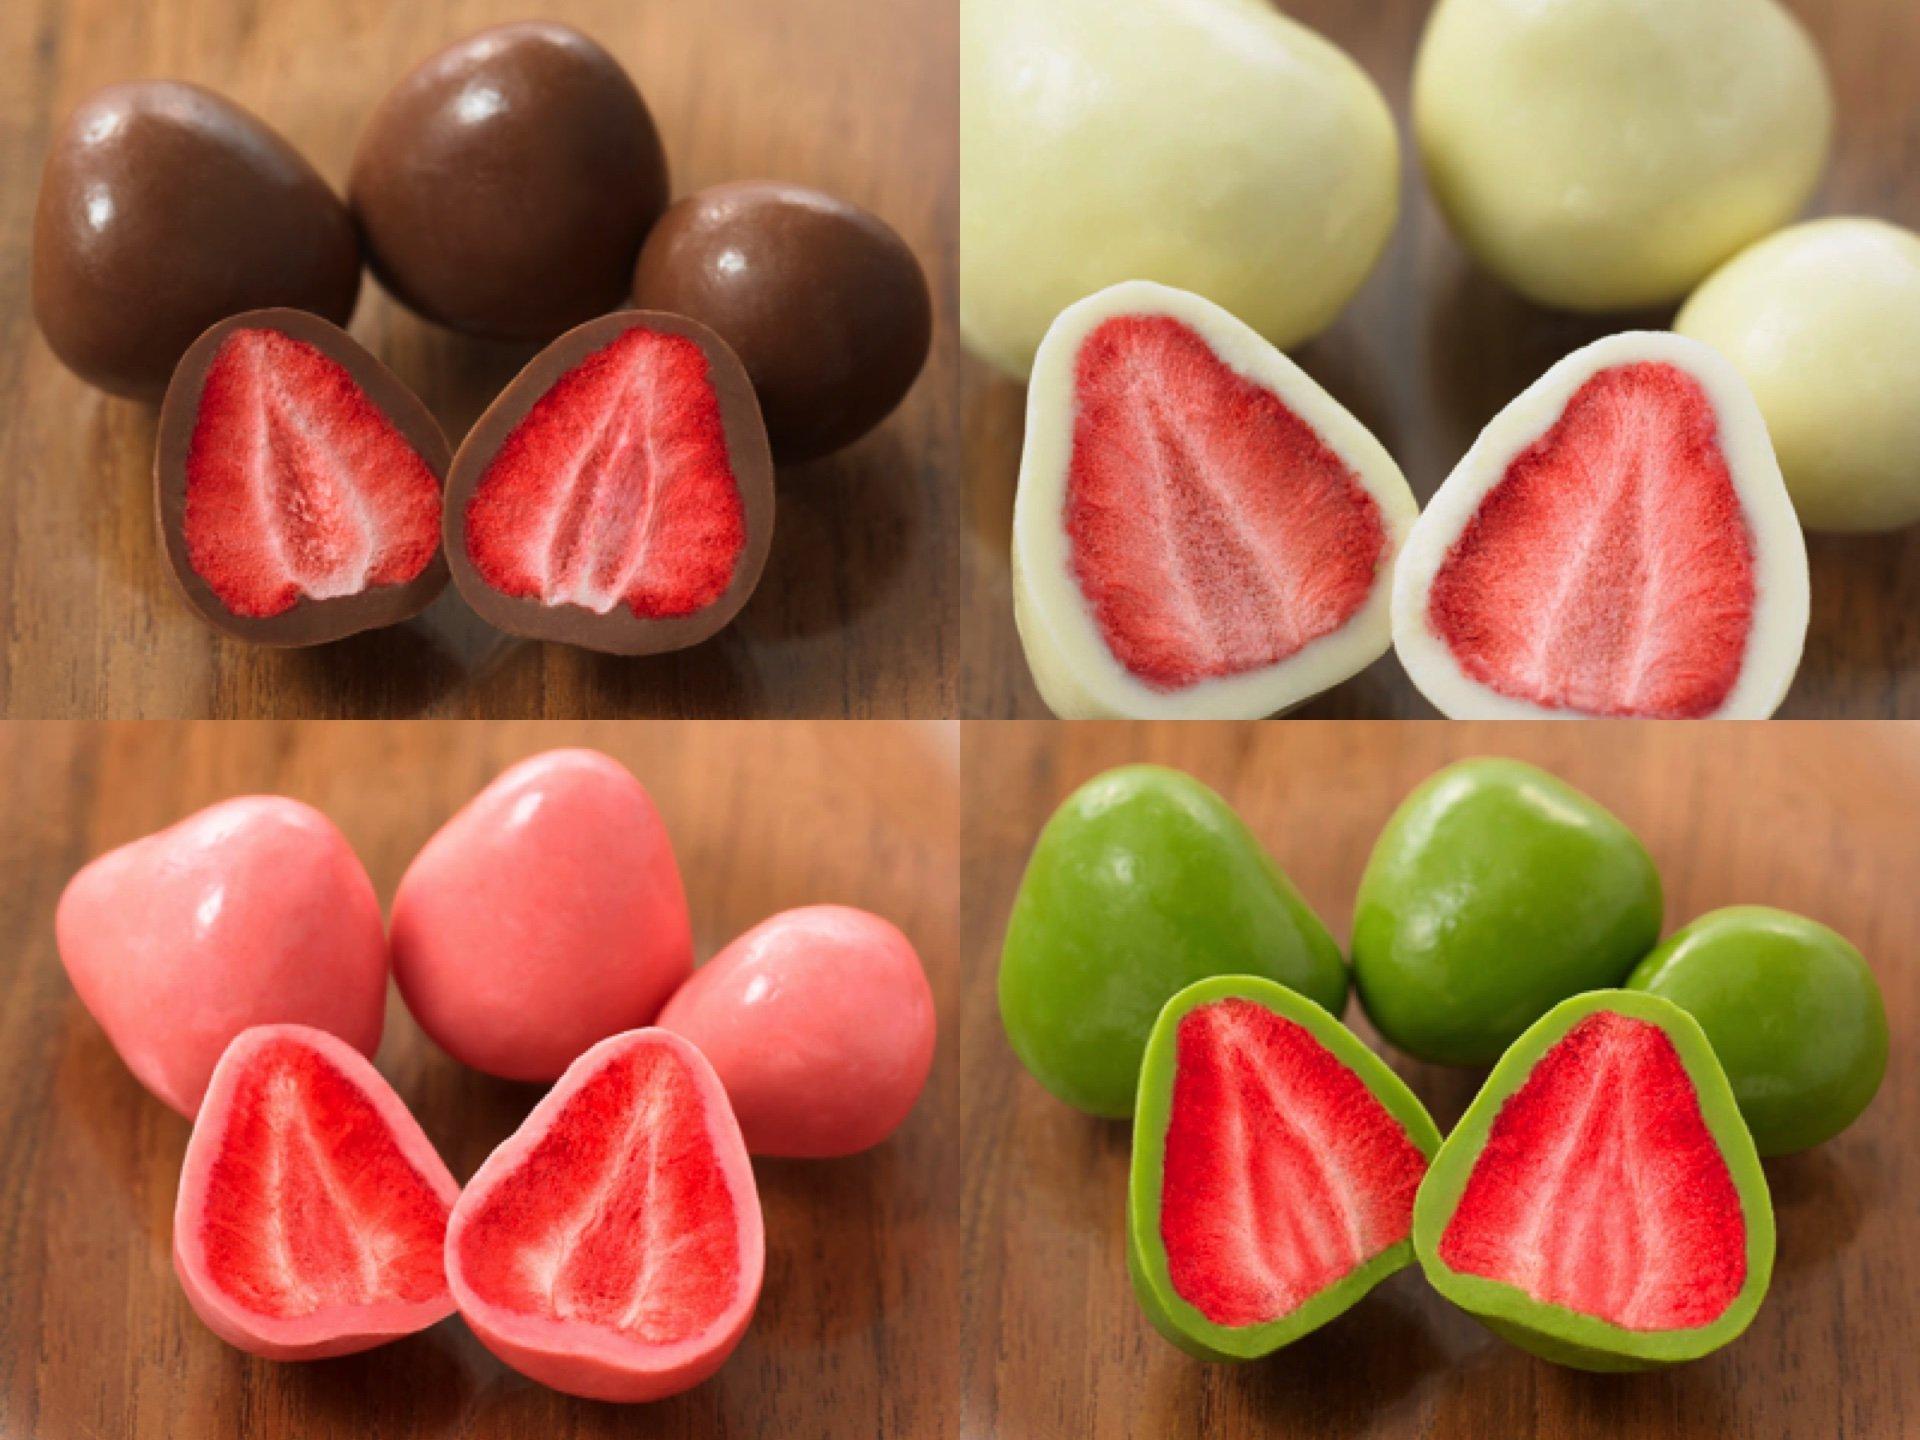 Muji Set of 4 Packs Coated Strawberry (Chocolate, White Chocolate, Strawberry Chocolate, Matcha Chocolate) (50g/each) [Japan Imported] Yummy by Muji